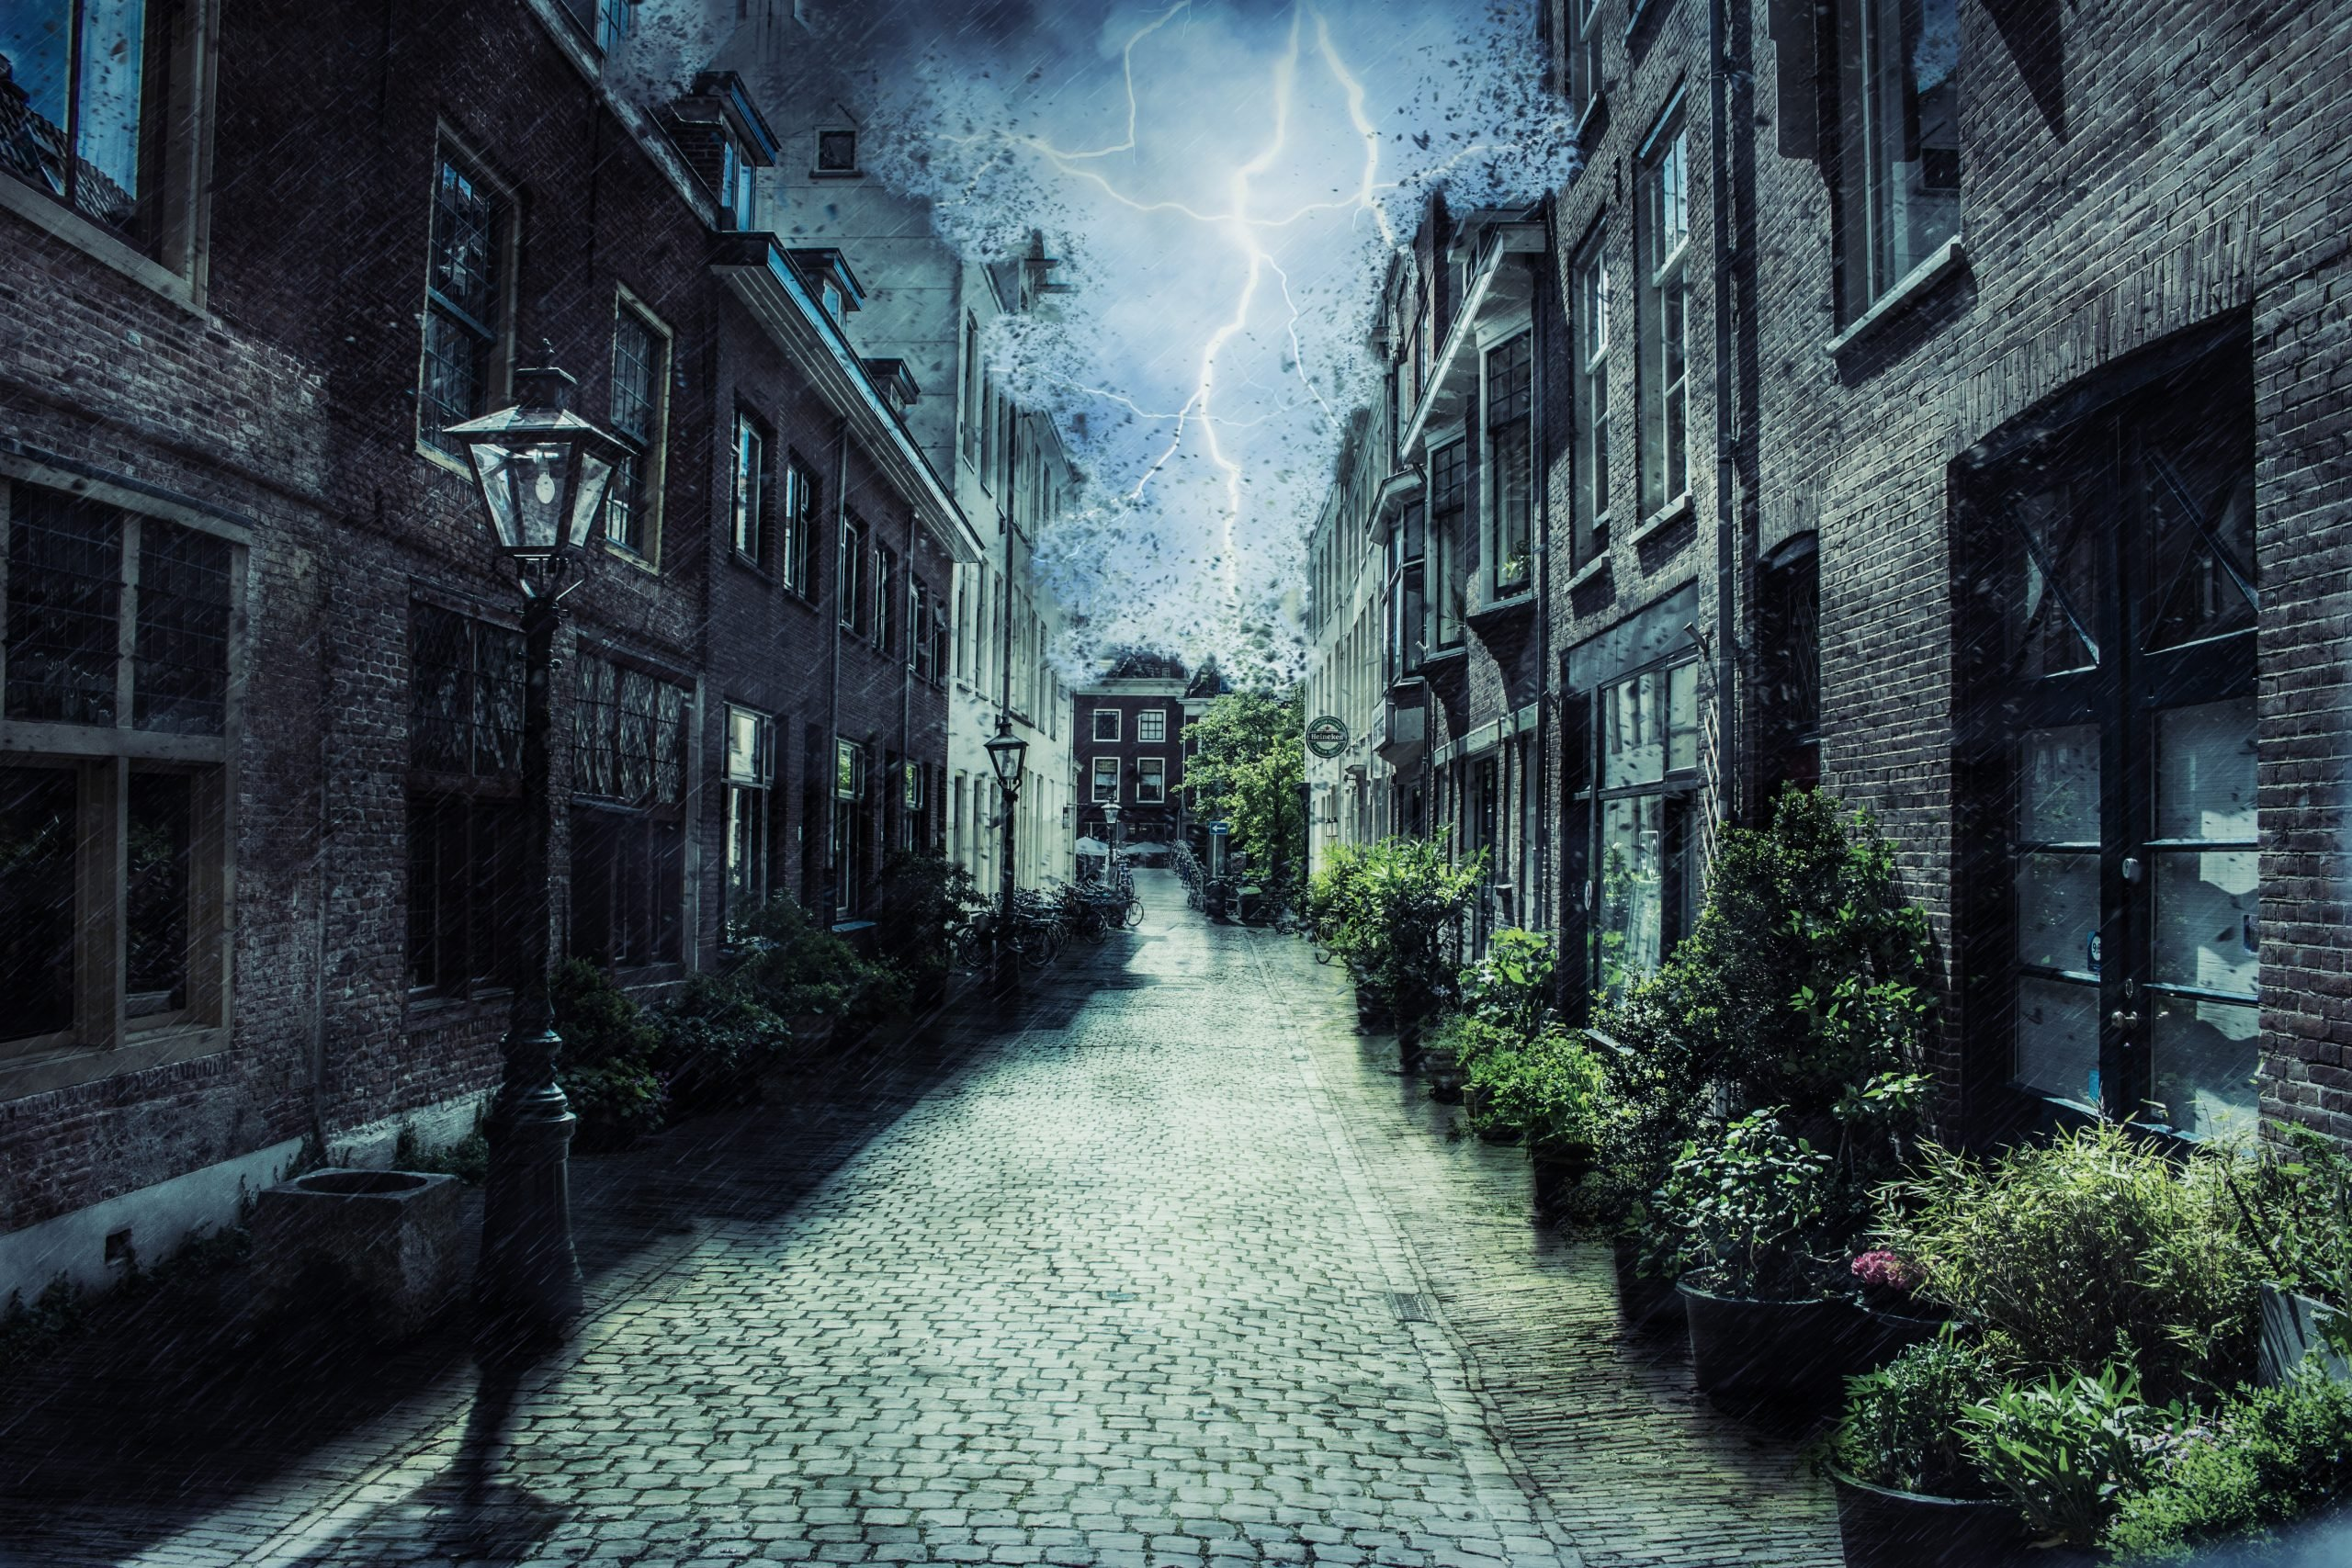 Thunderstorm near houses